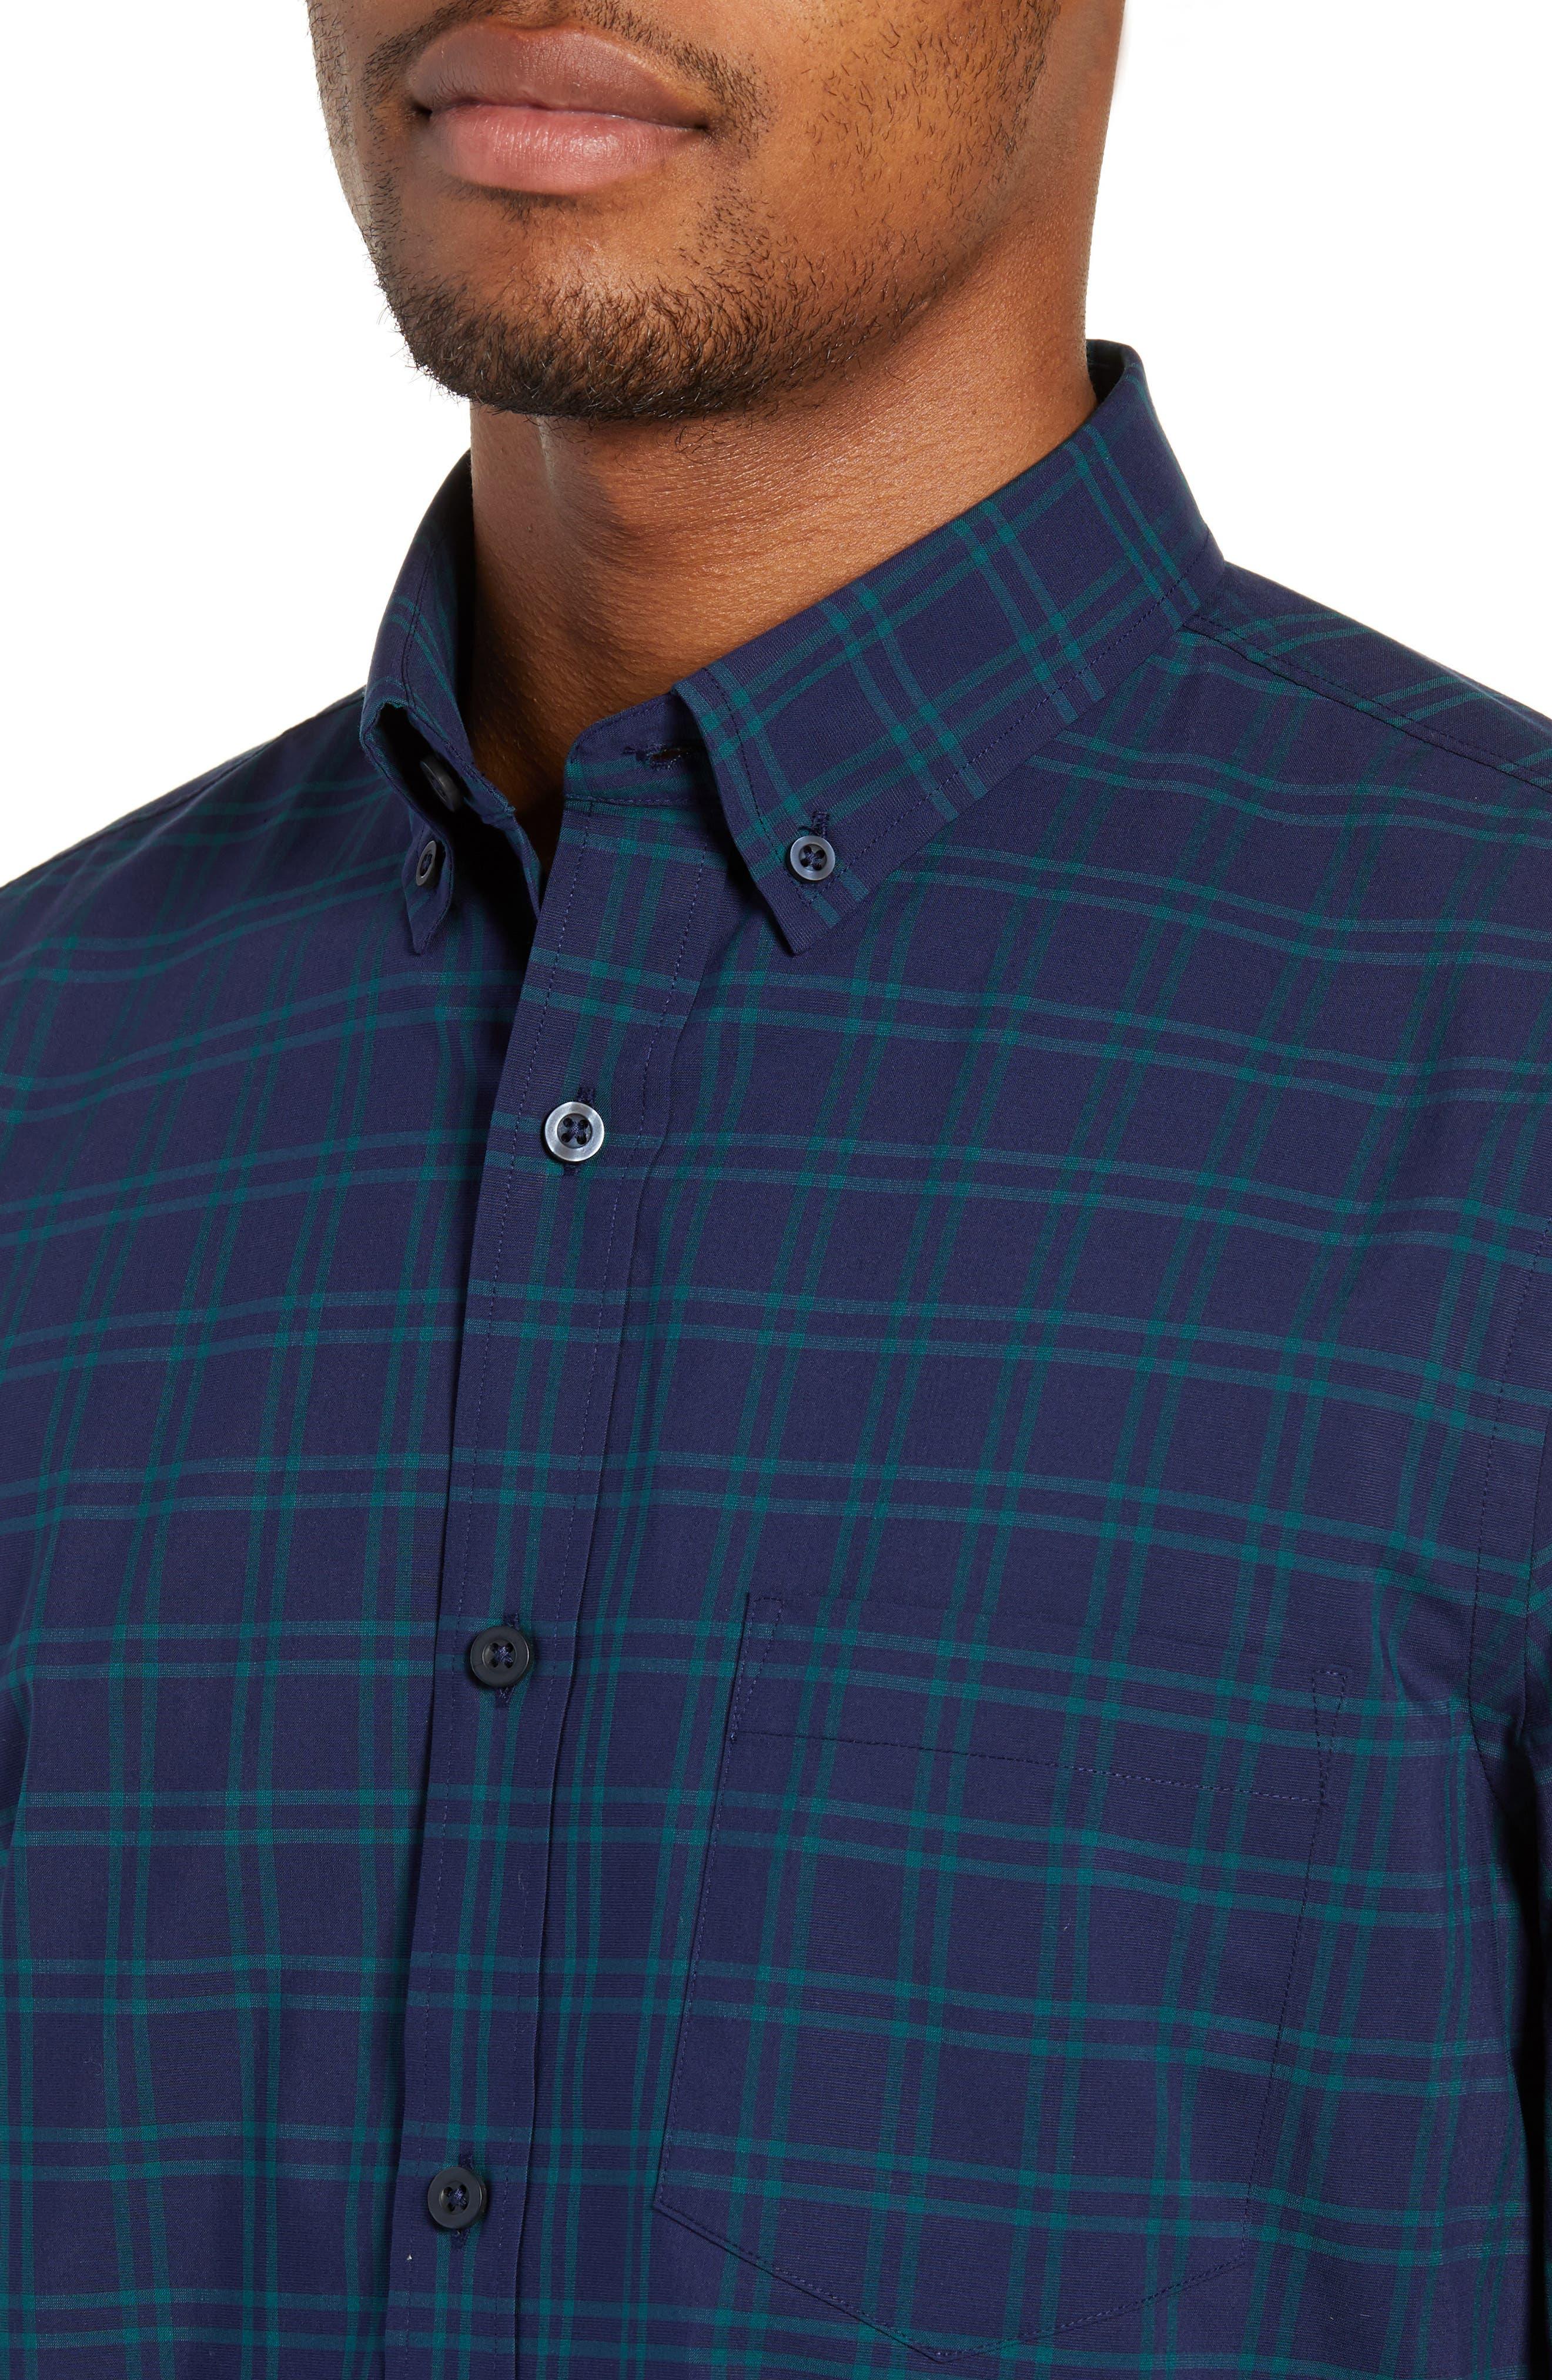 NORDSTROM MEN'S SHOP,                             Tech-Smart Slim Fit Check Sport Shirt,                             Alternate thumbnail 4, color,                             NAVY IRIS TEAL WINDOWPANE